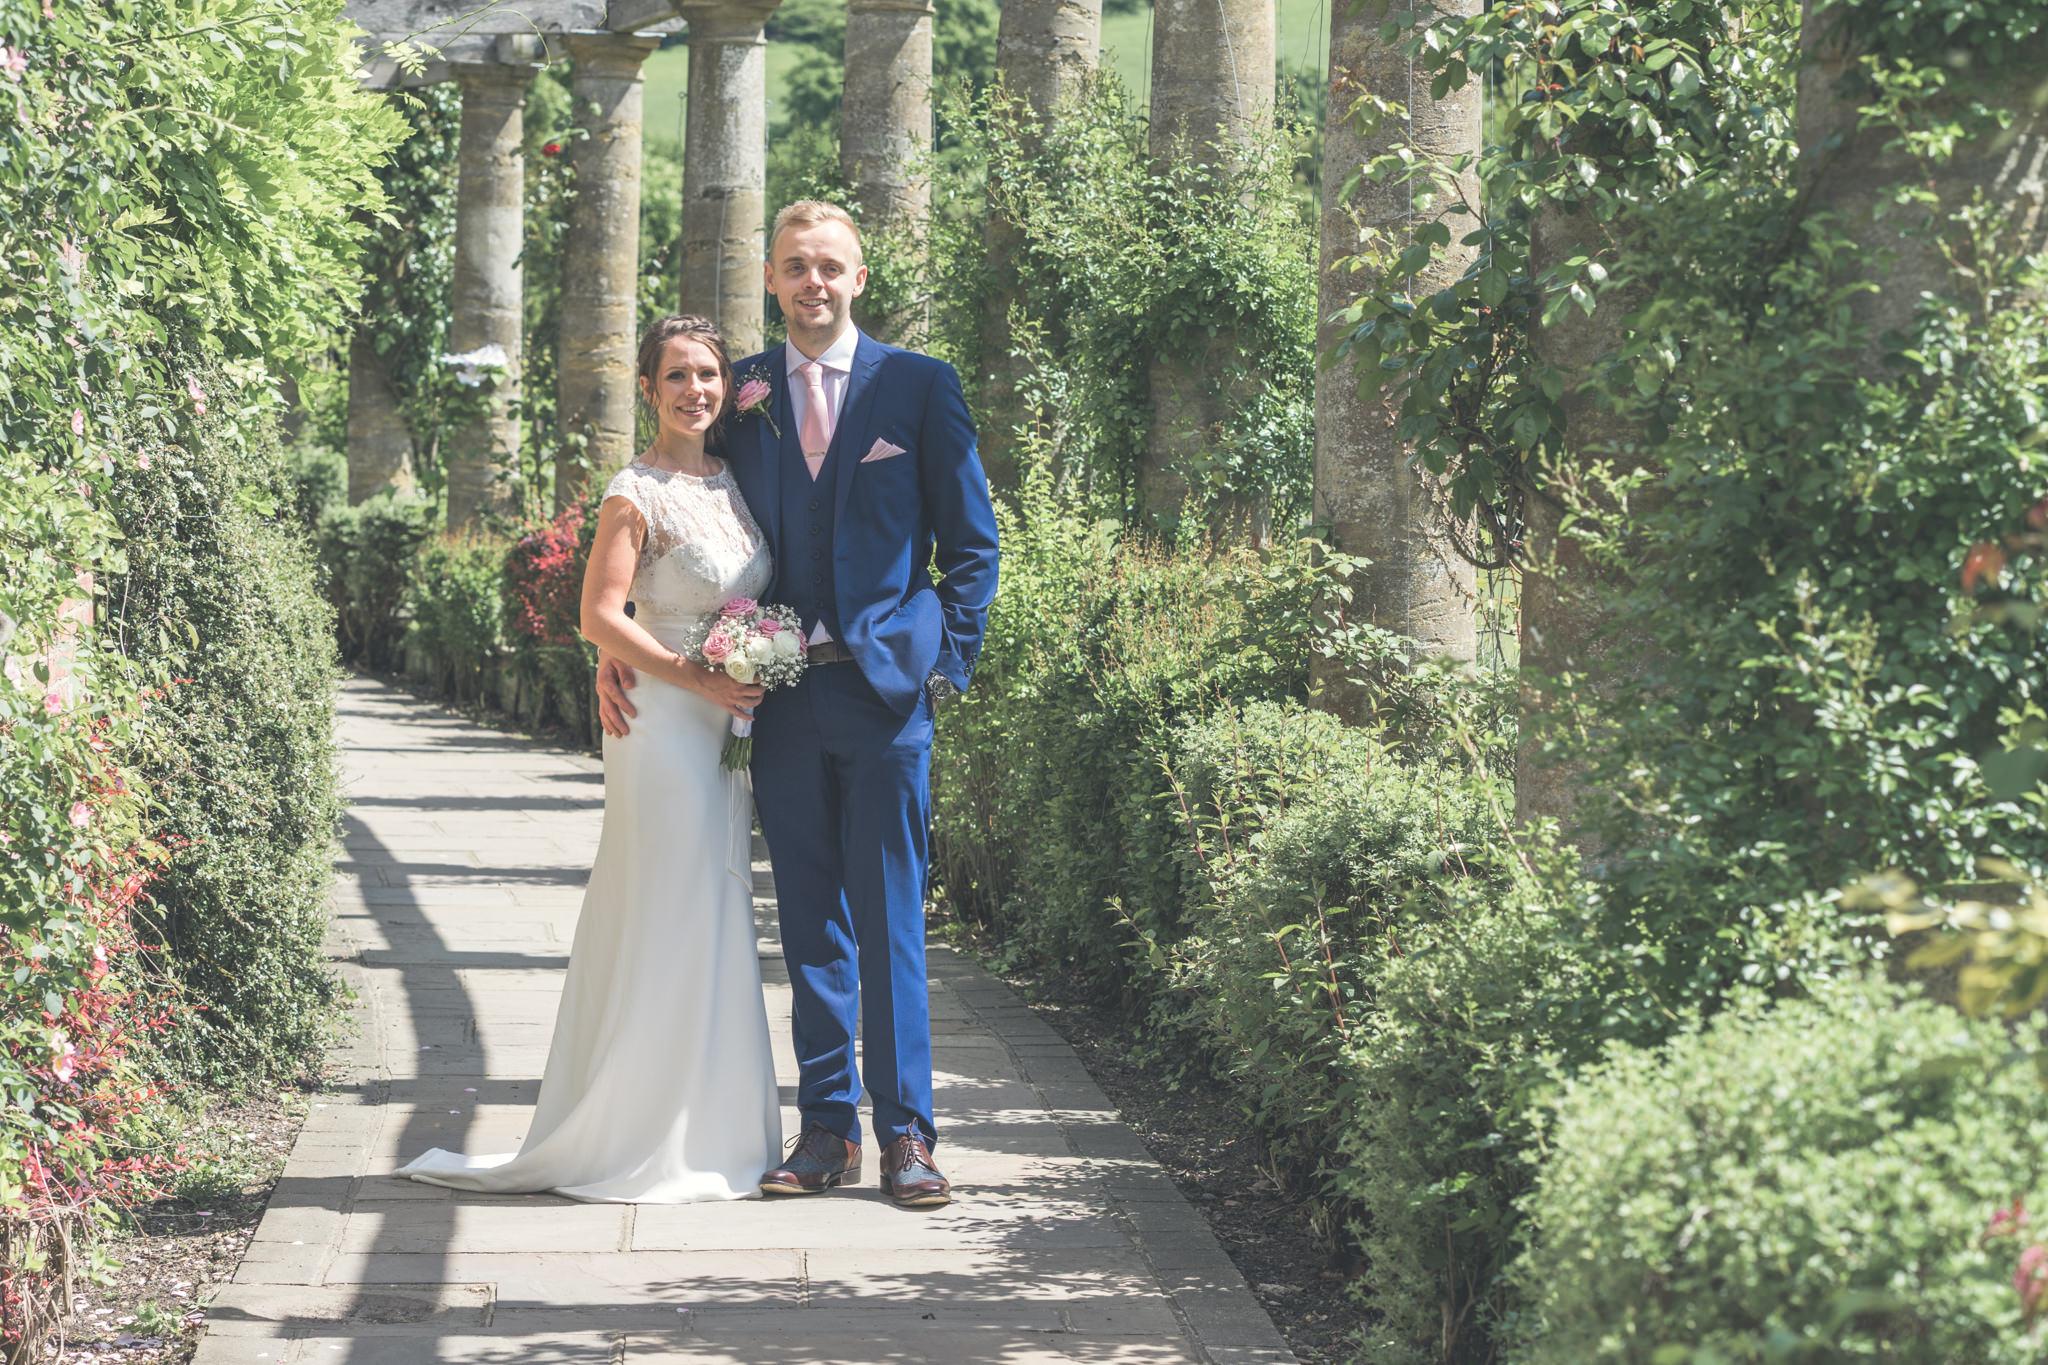 Woldingham School Wedding - Robin Ball Photography - Kate and Lee-032.jpg